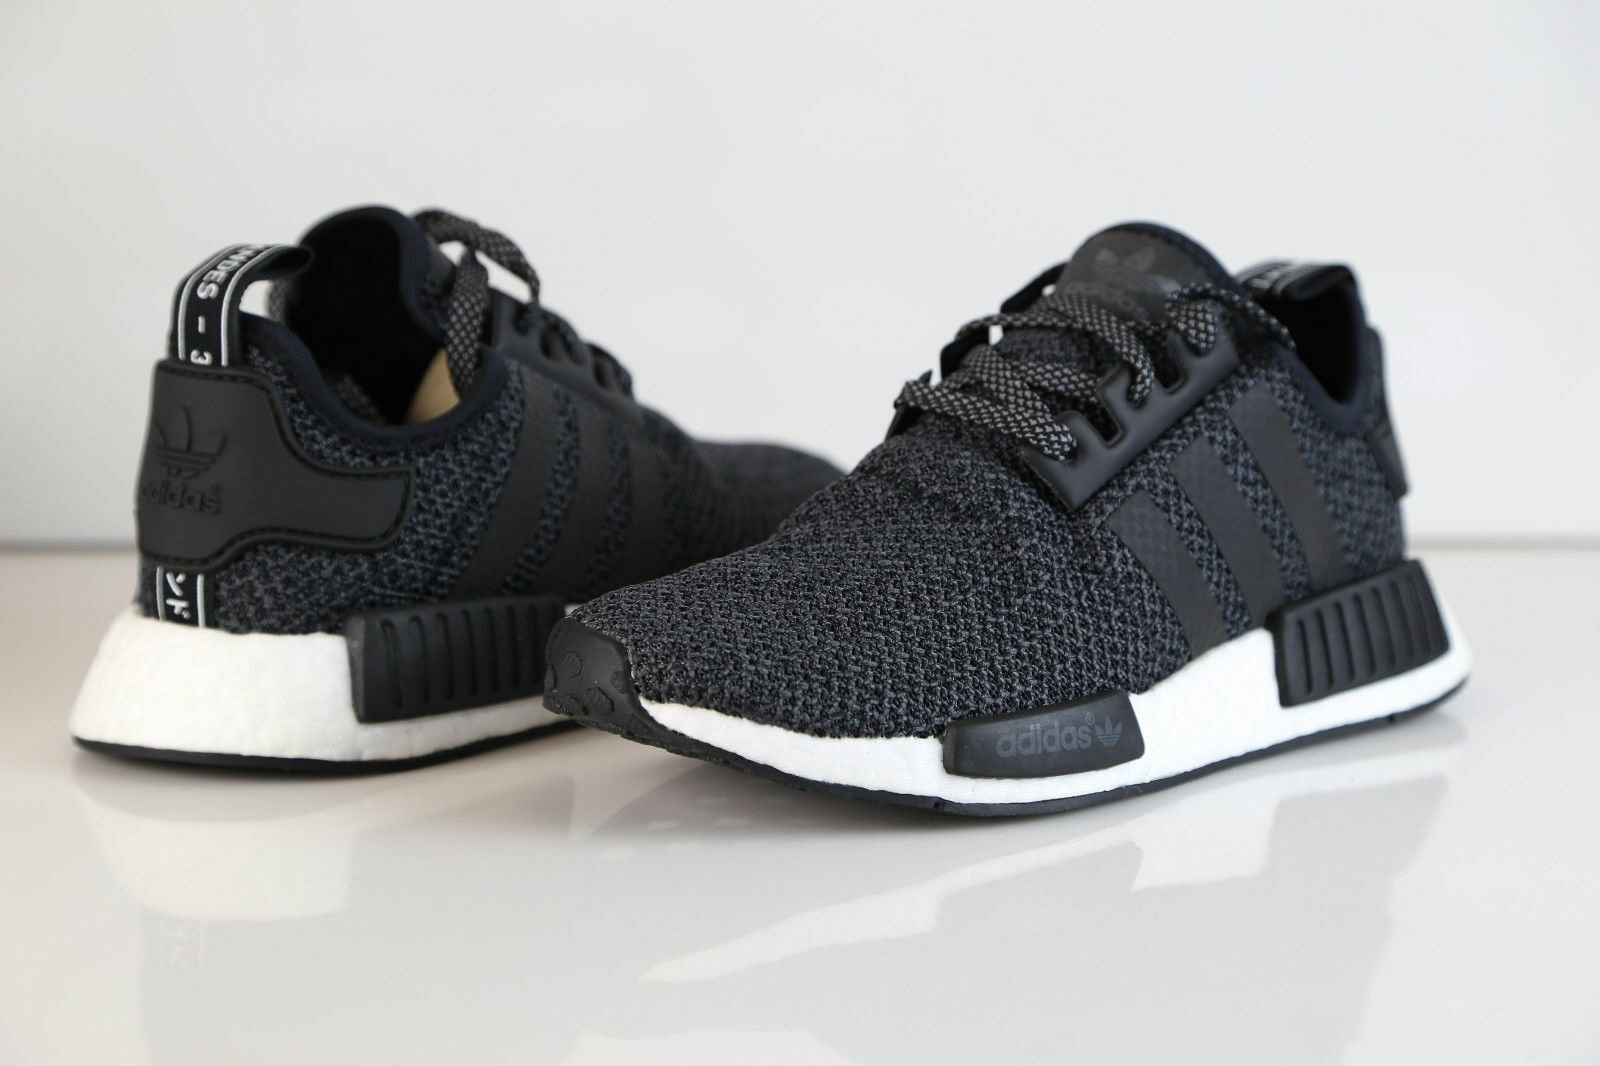 NEW Adidas NMD R1 Champ Exclusive Black Reflective 3M WOOL RARE BA7842